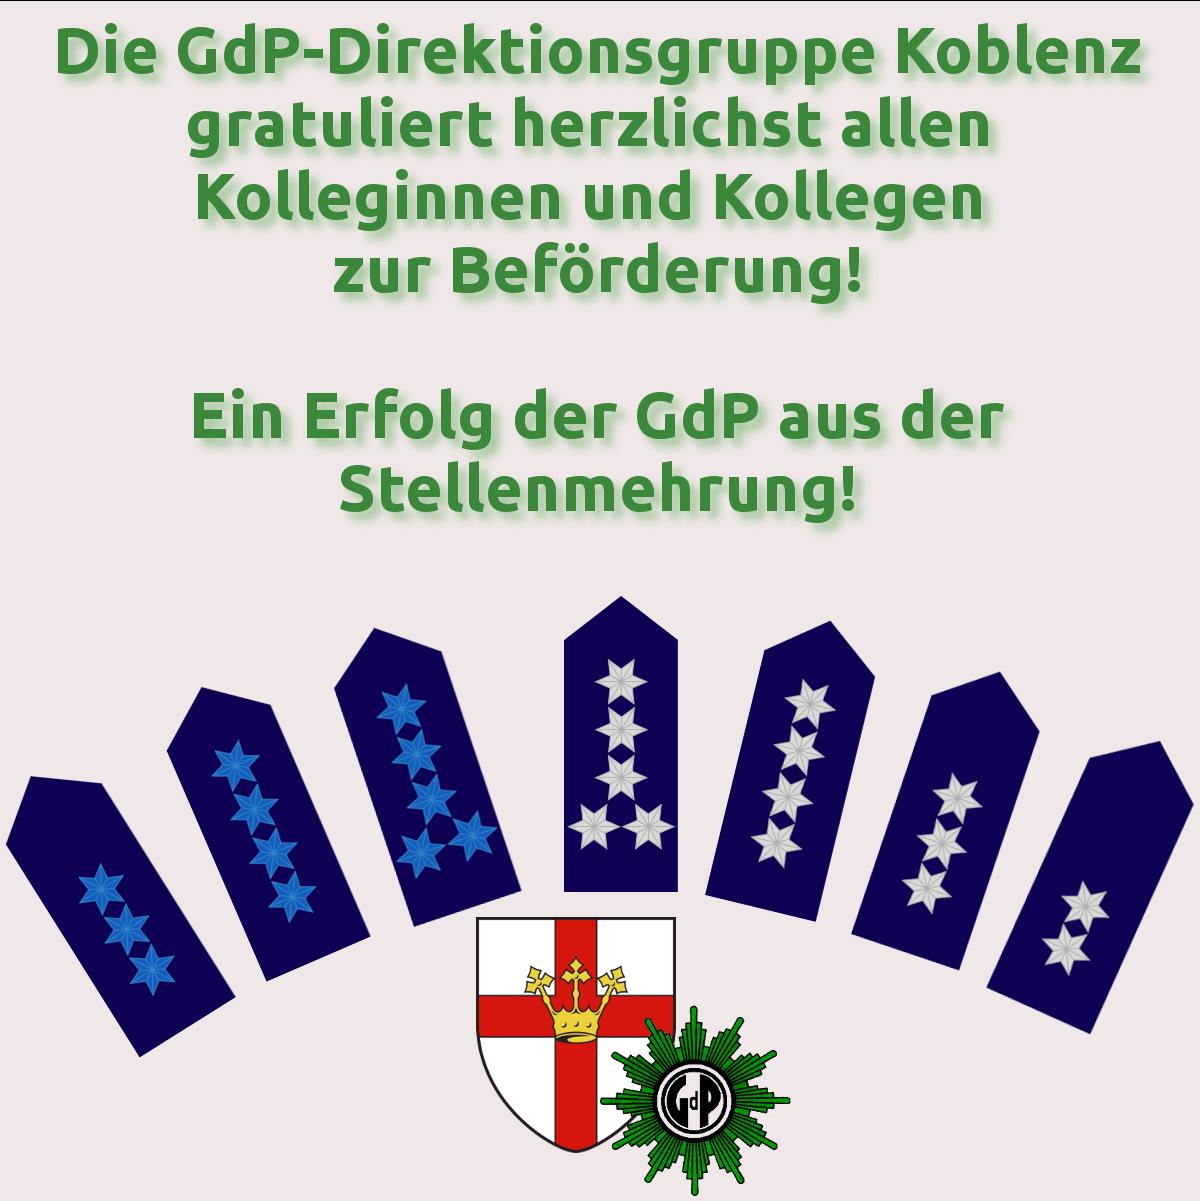 gratulation_zur_bforderung_dgkoblenz